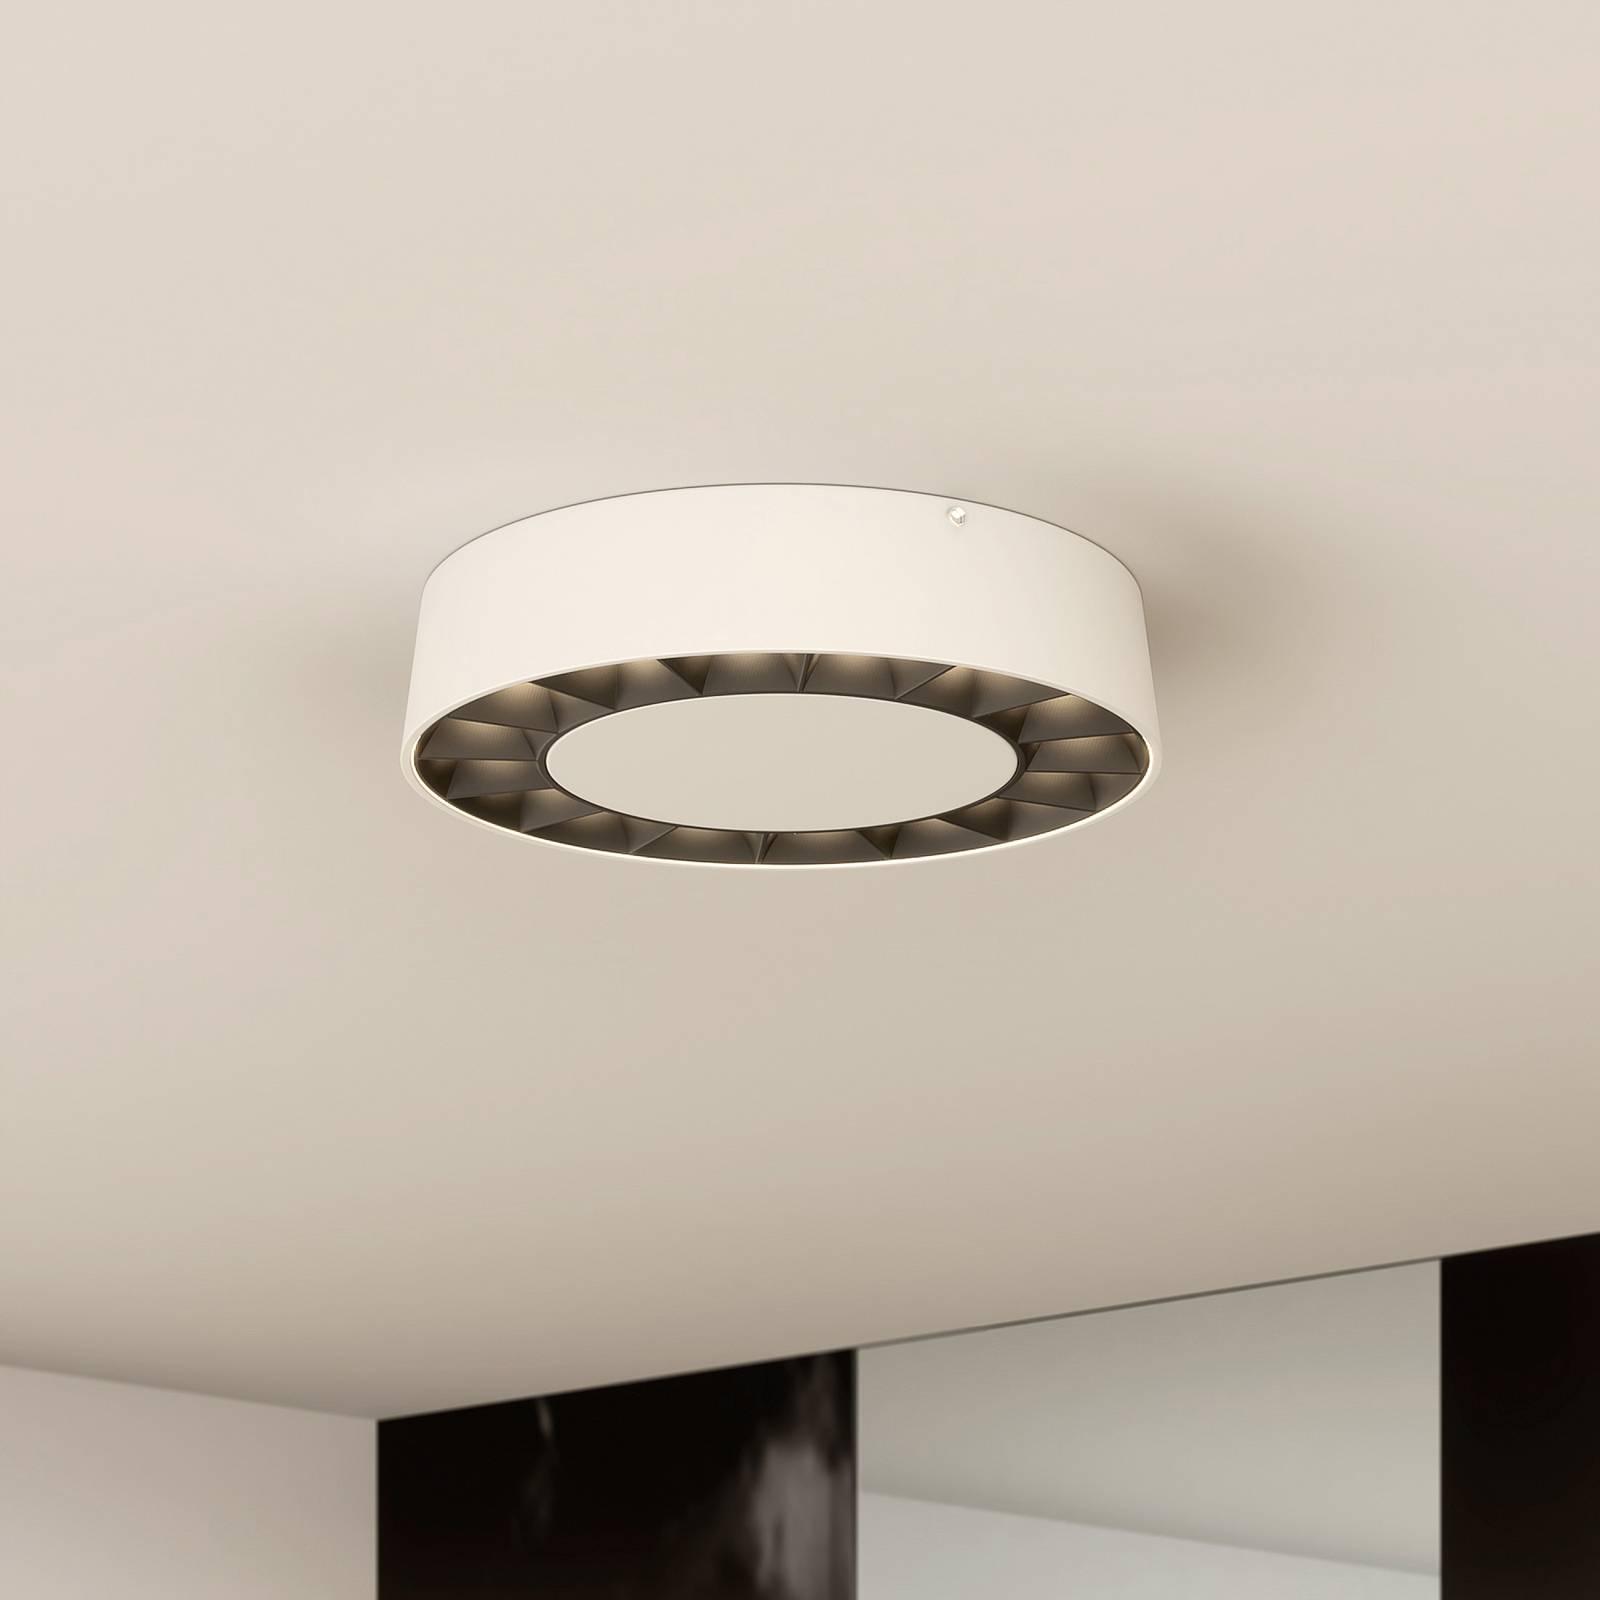 Lucande lampa sufitowa LED Kelissa biała okrągła